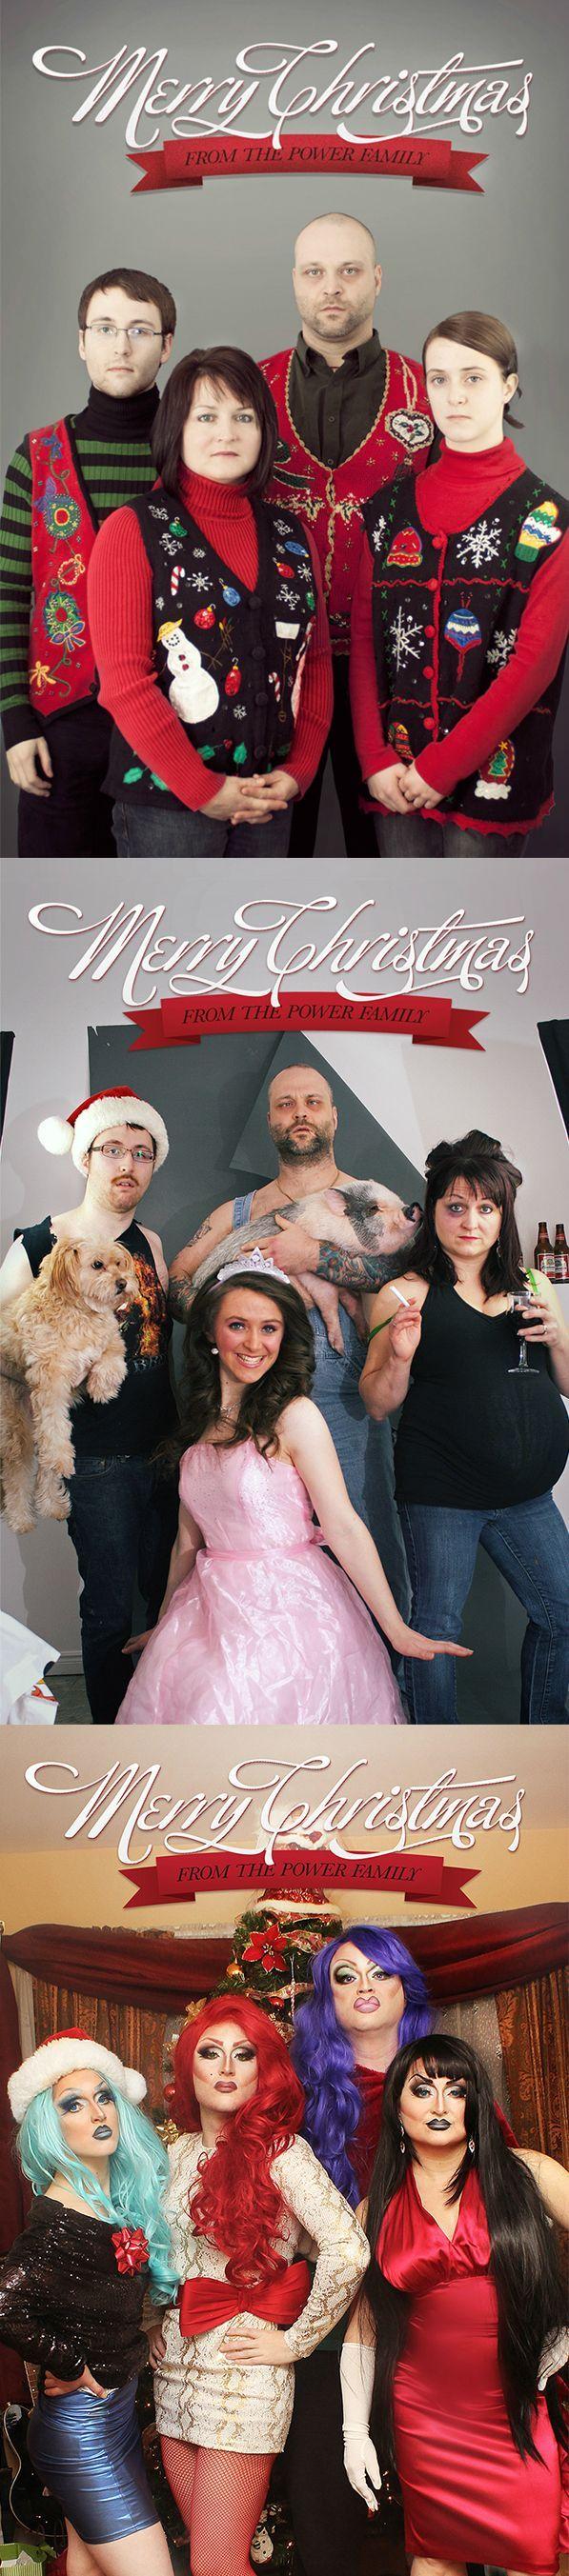 Three Years of Christmas Family Photos Funny